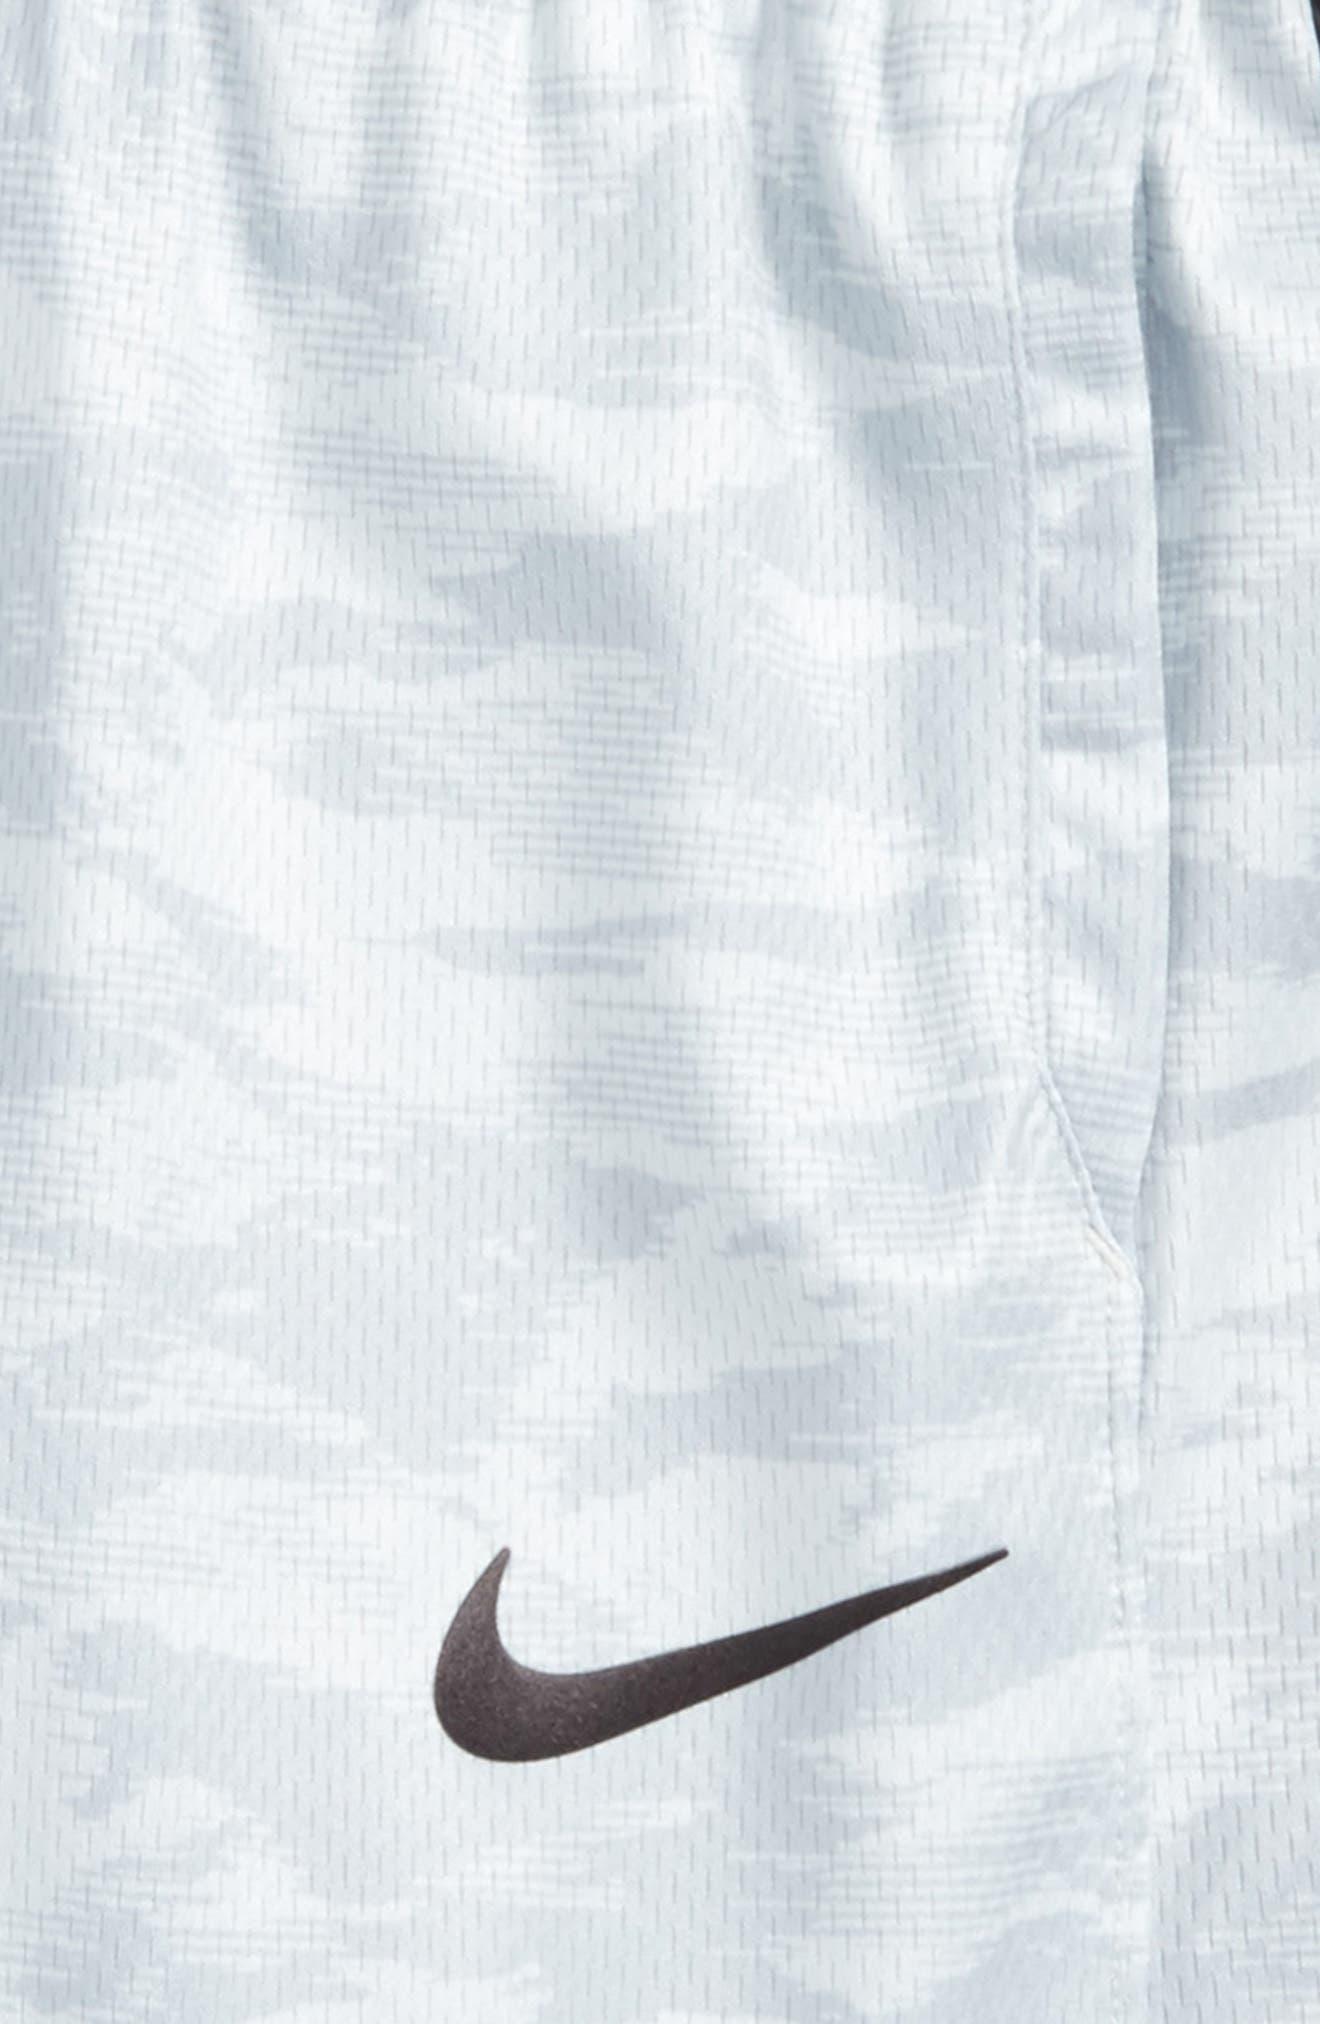 Dry Elite Basketball Shorts,                             Alternate thumbnail 2, color,                             Wlfgry/ Black